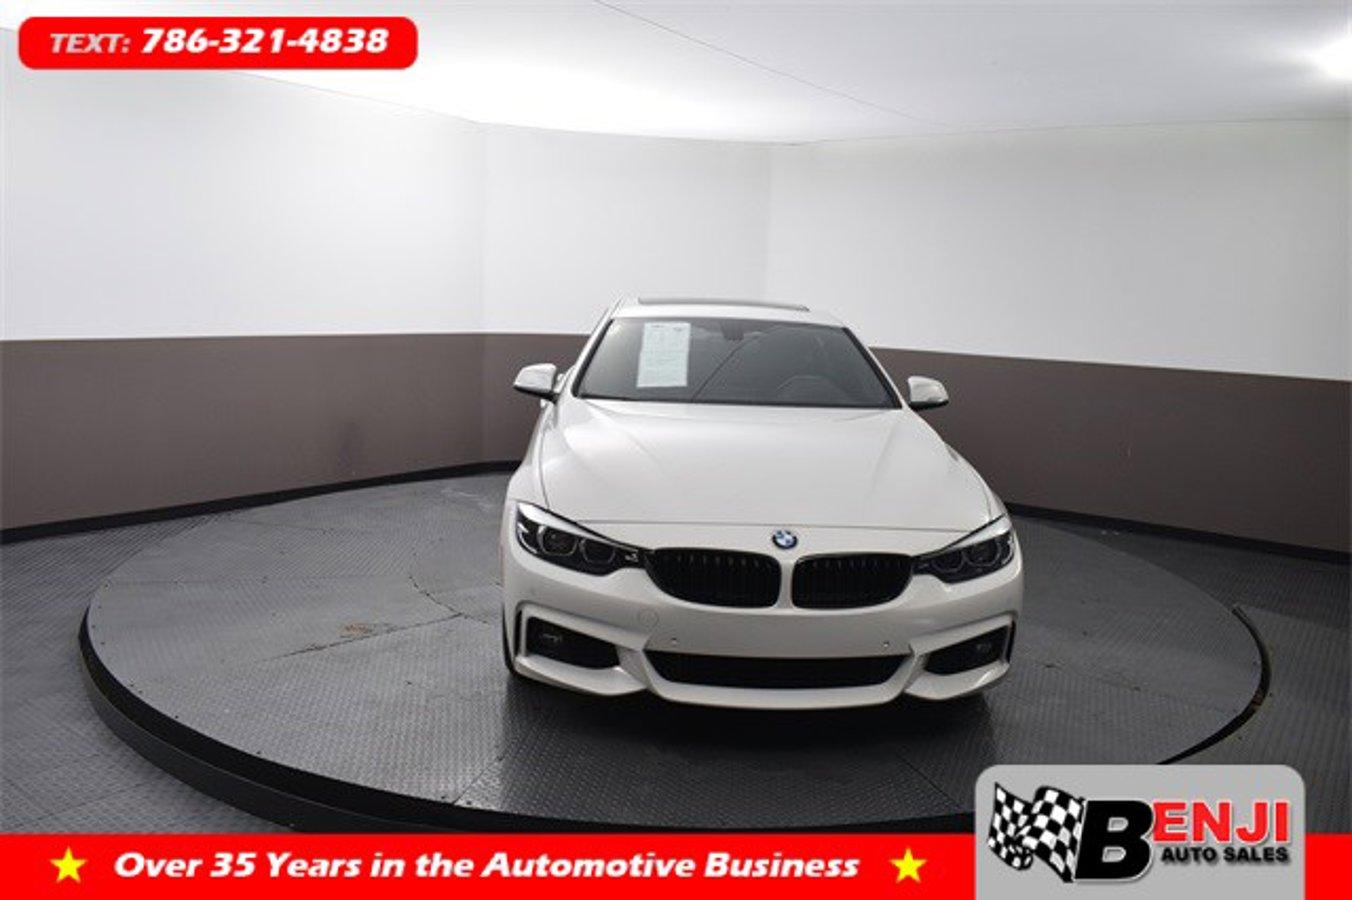 Used BMW 4-SERIES 2019 BROWARD 430I